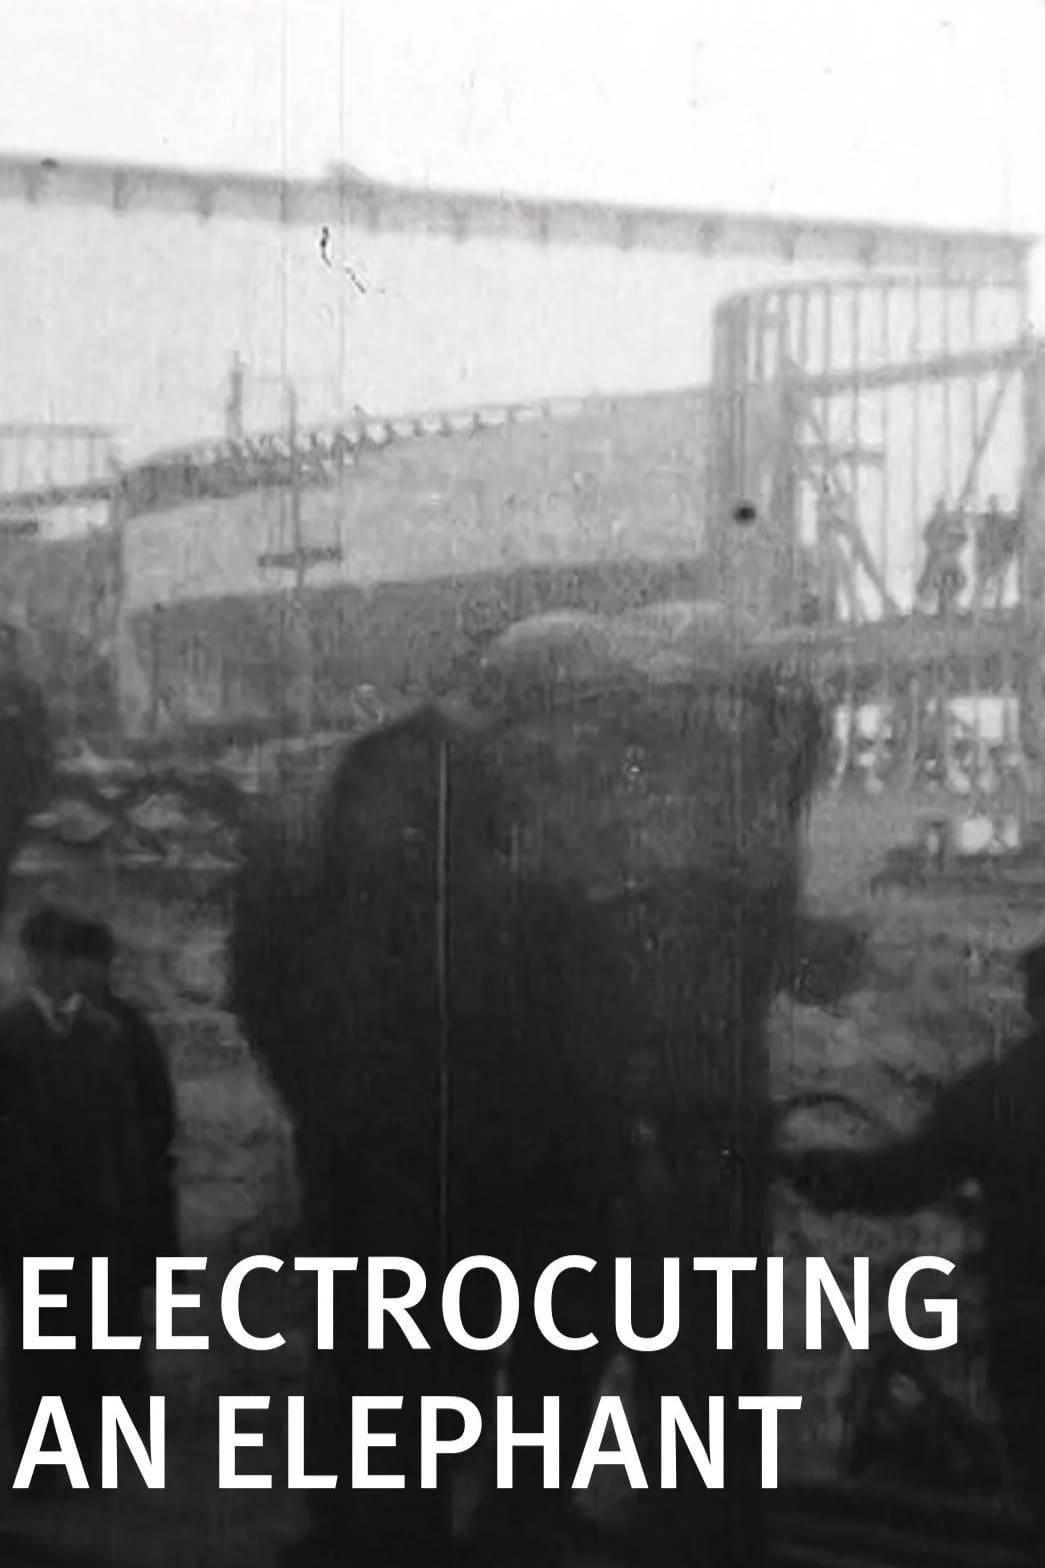 Electrocuting an Elephant (1903)